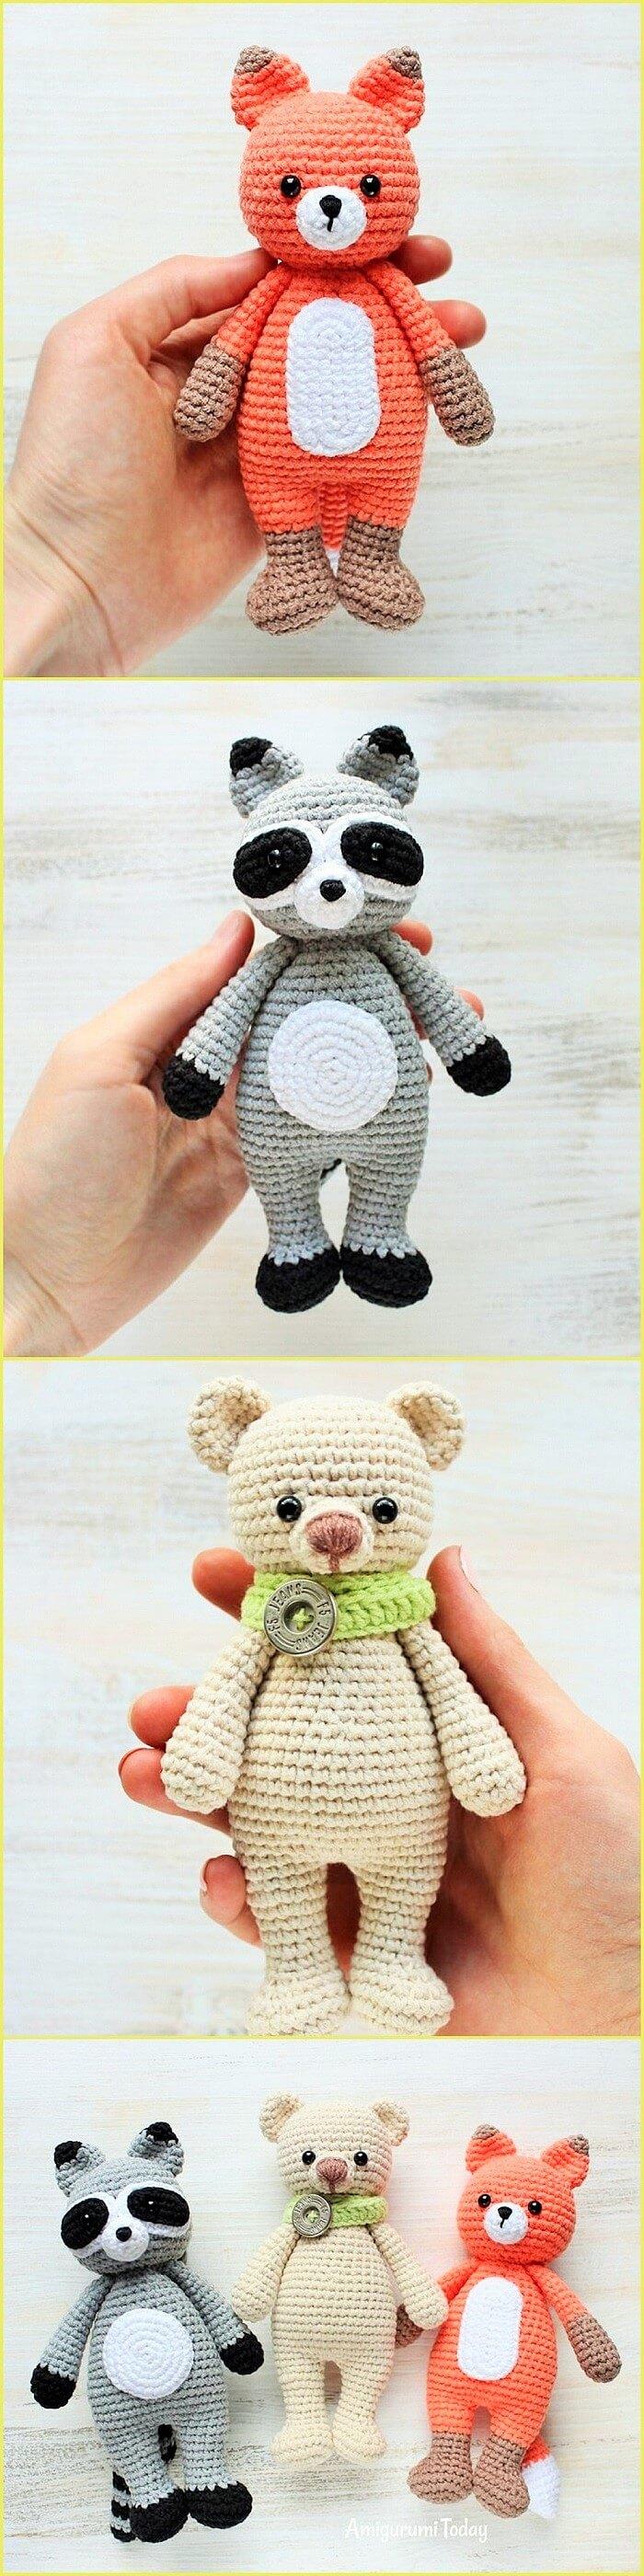 Crochet toys Ideas-2 (2)